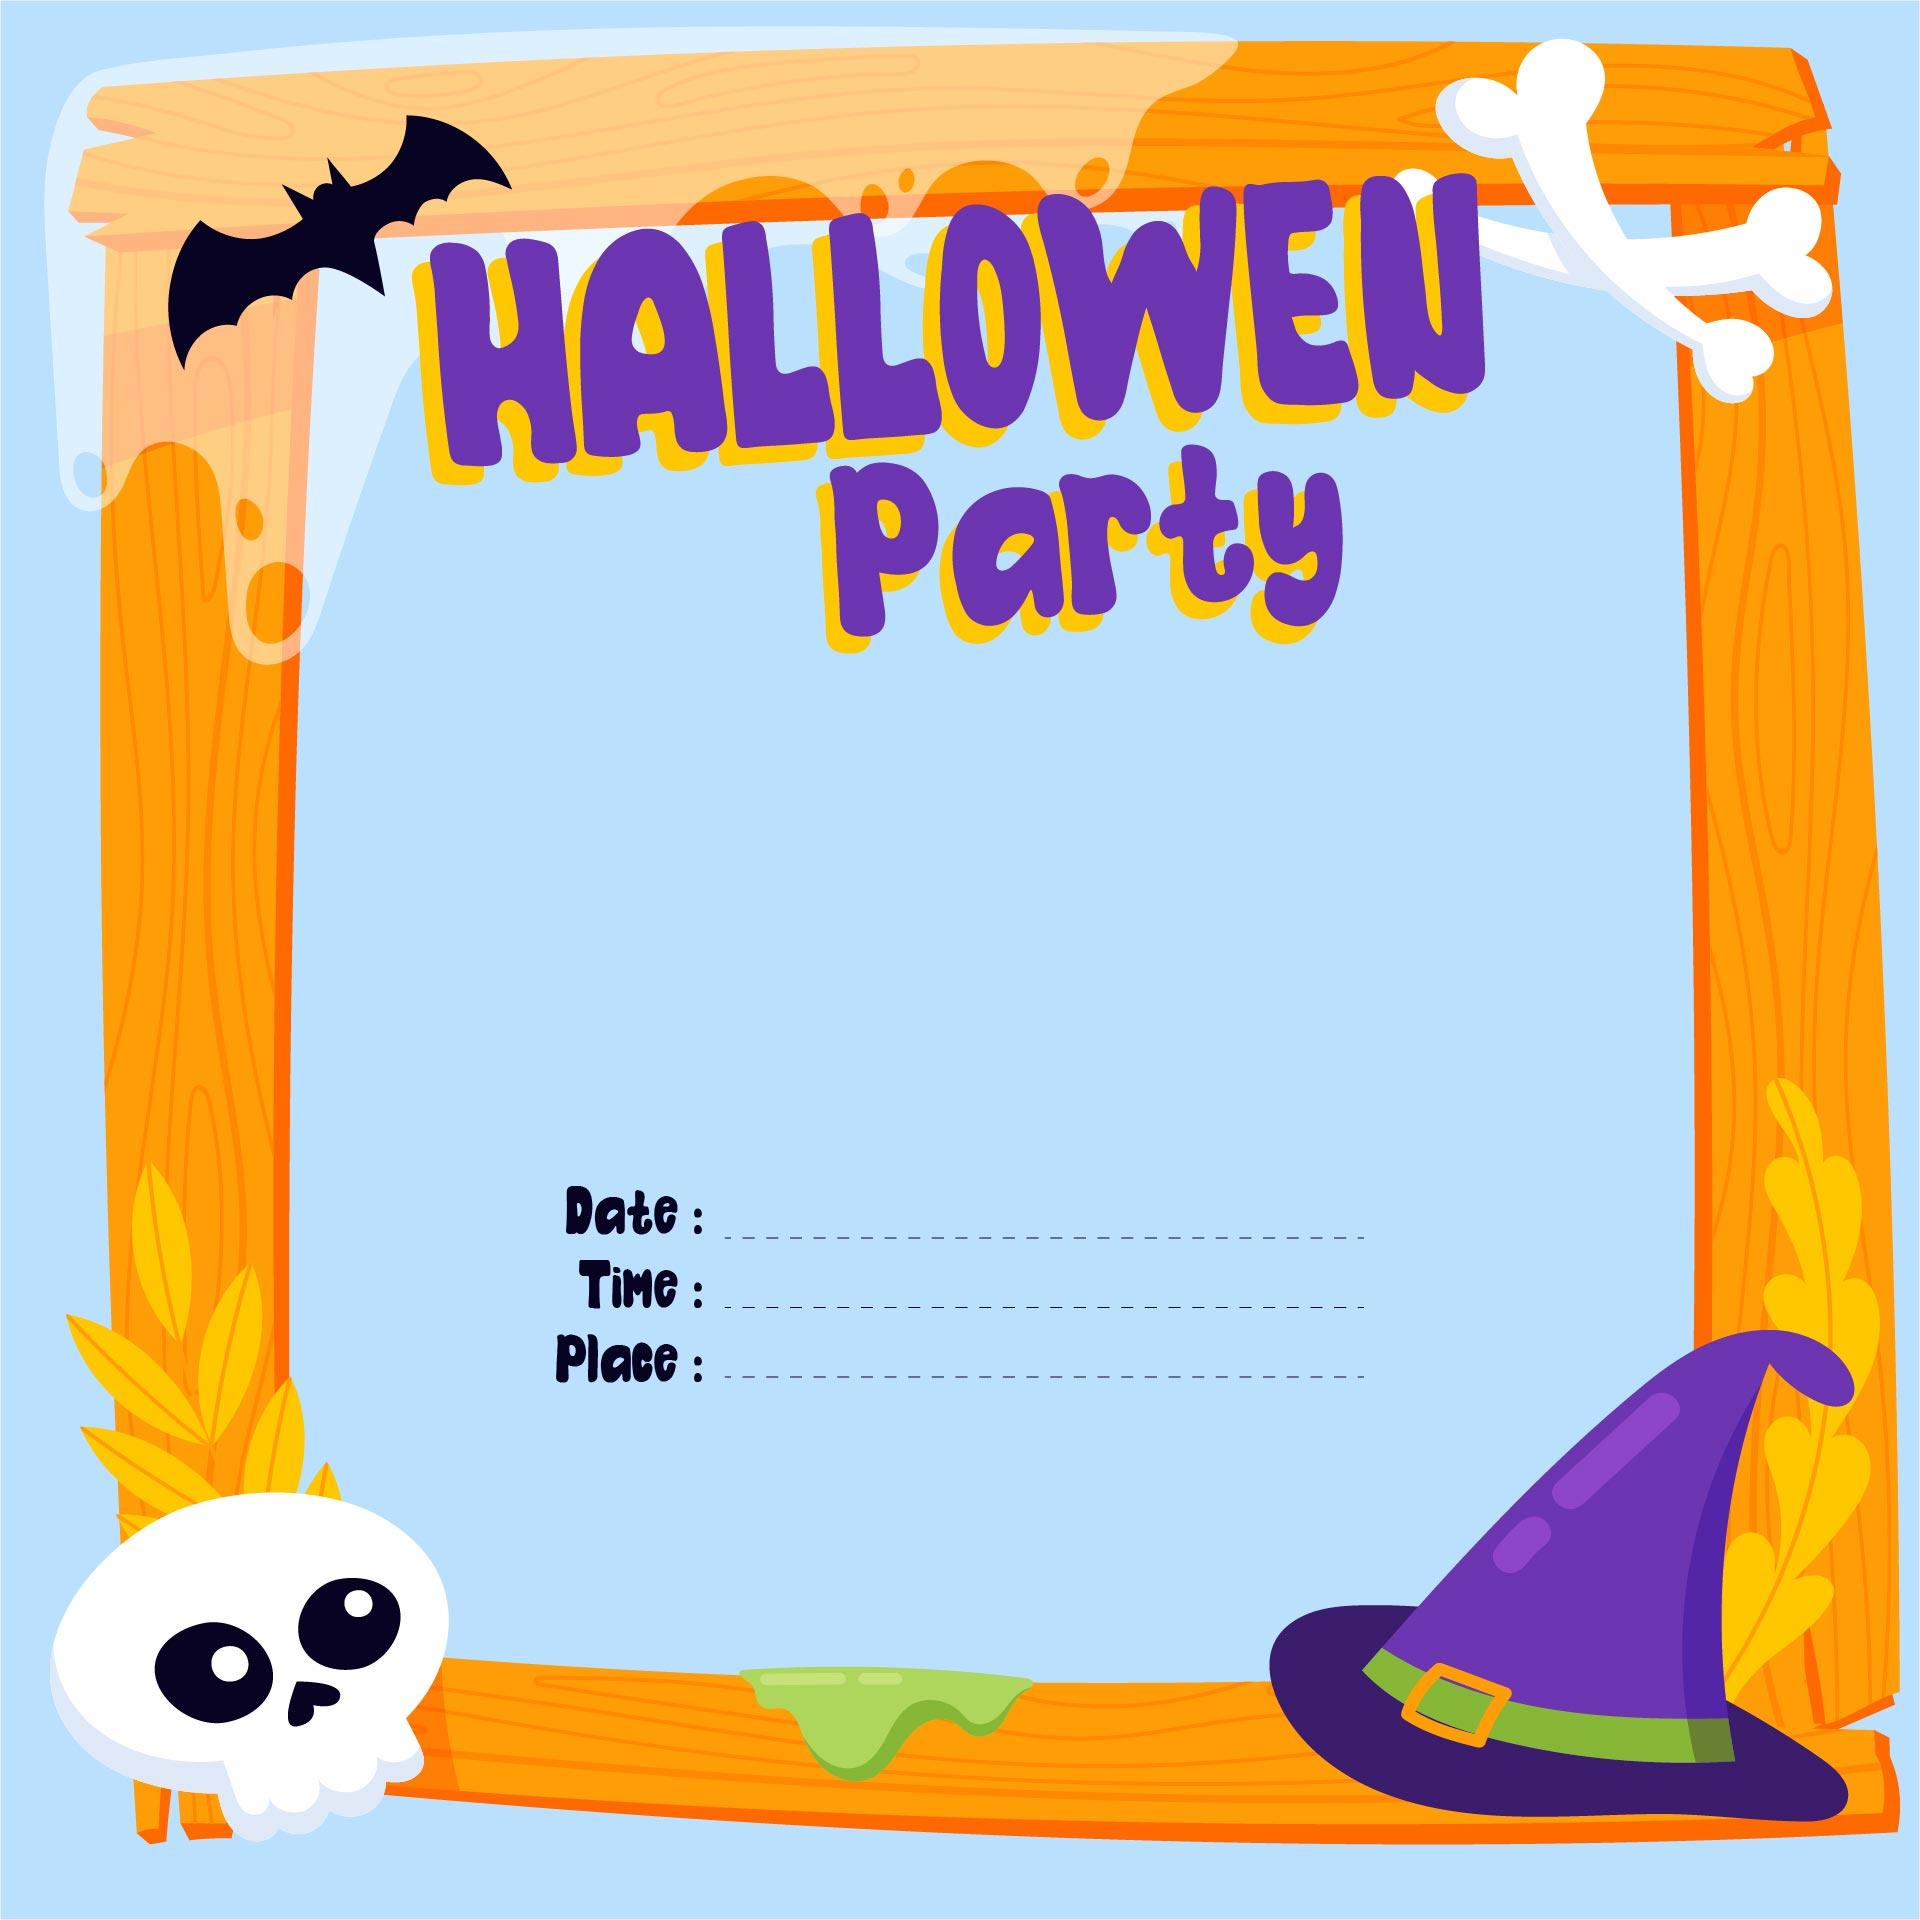 Printable Halloween Party Invitations Free – Costume Party Invitations Free Printable